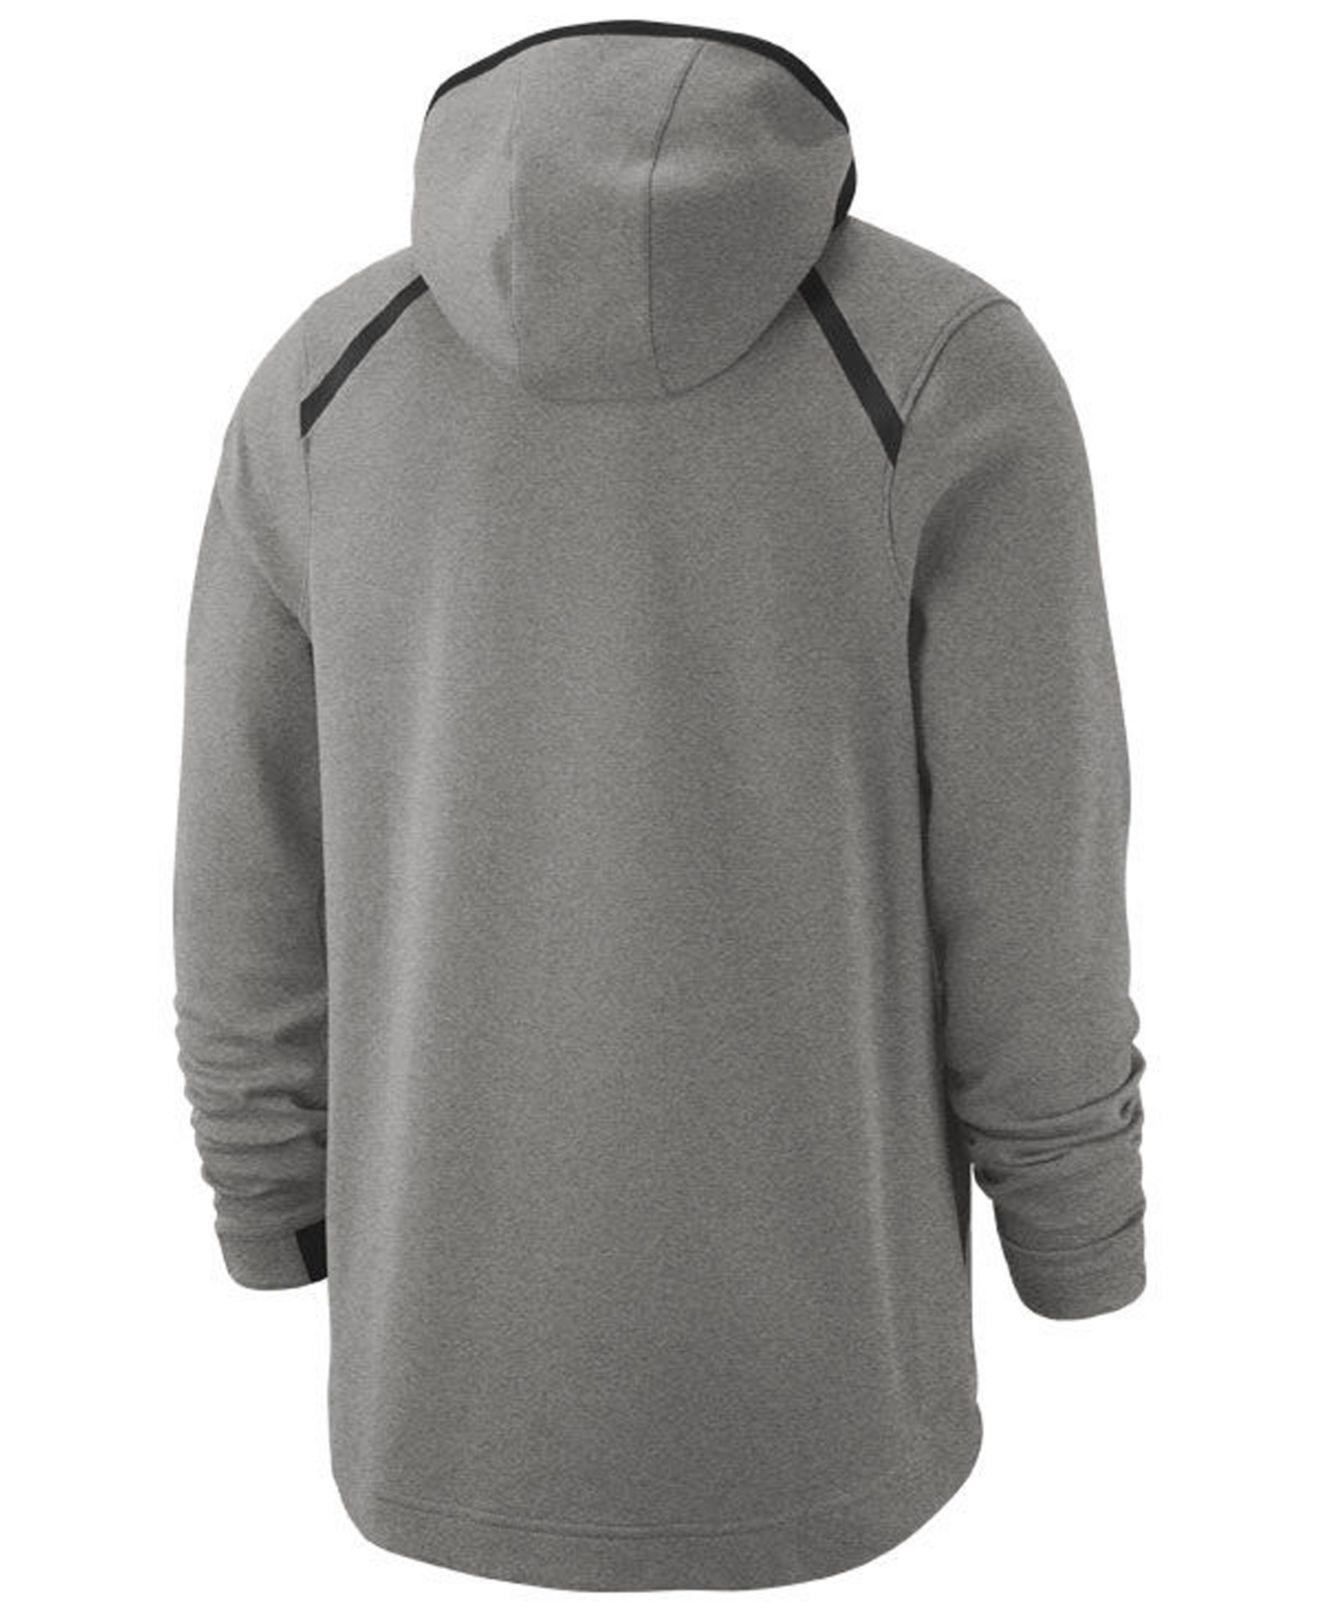 bf1931b87de8 Lyst - Nike New York Knicks Dry Showtime Full-zip Hoodie in Gray for Men